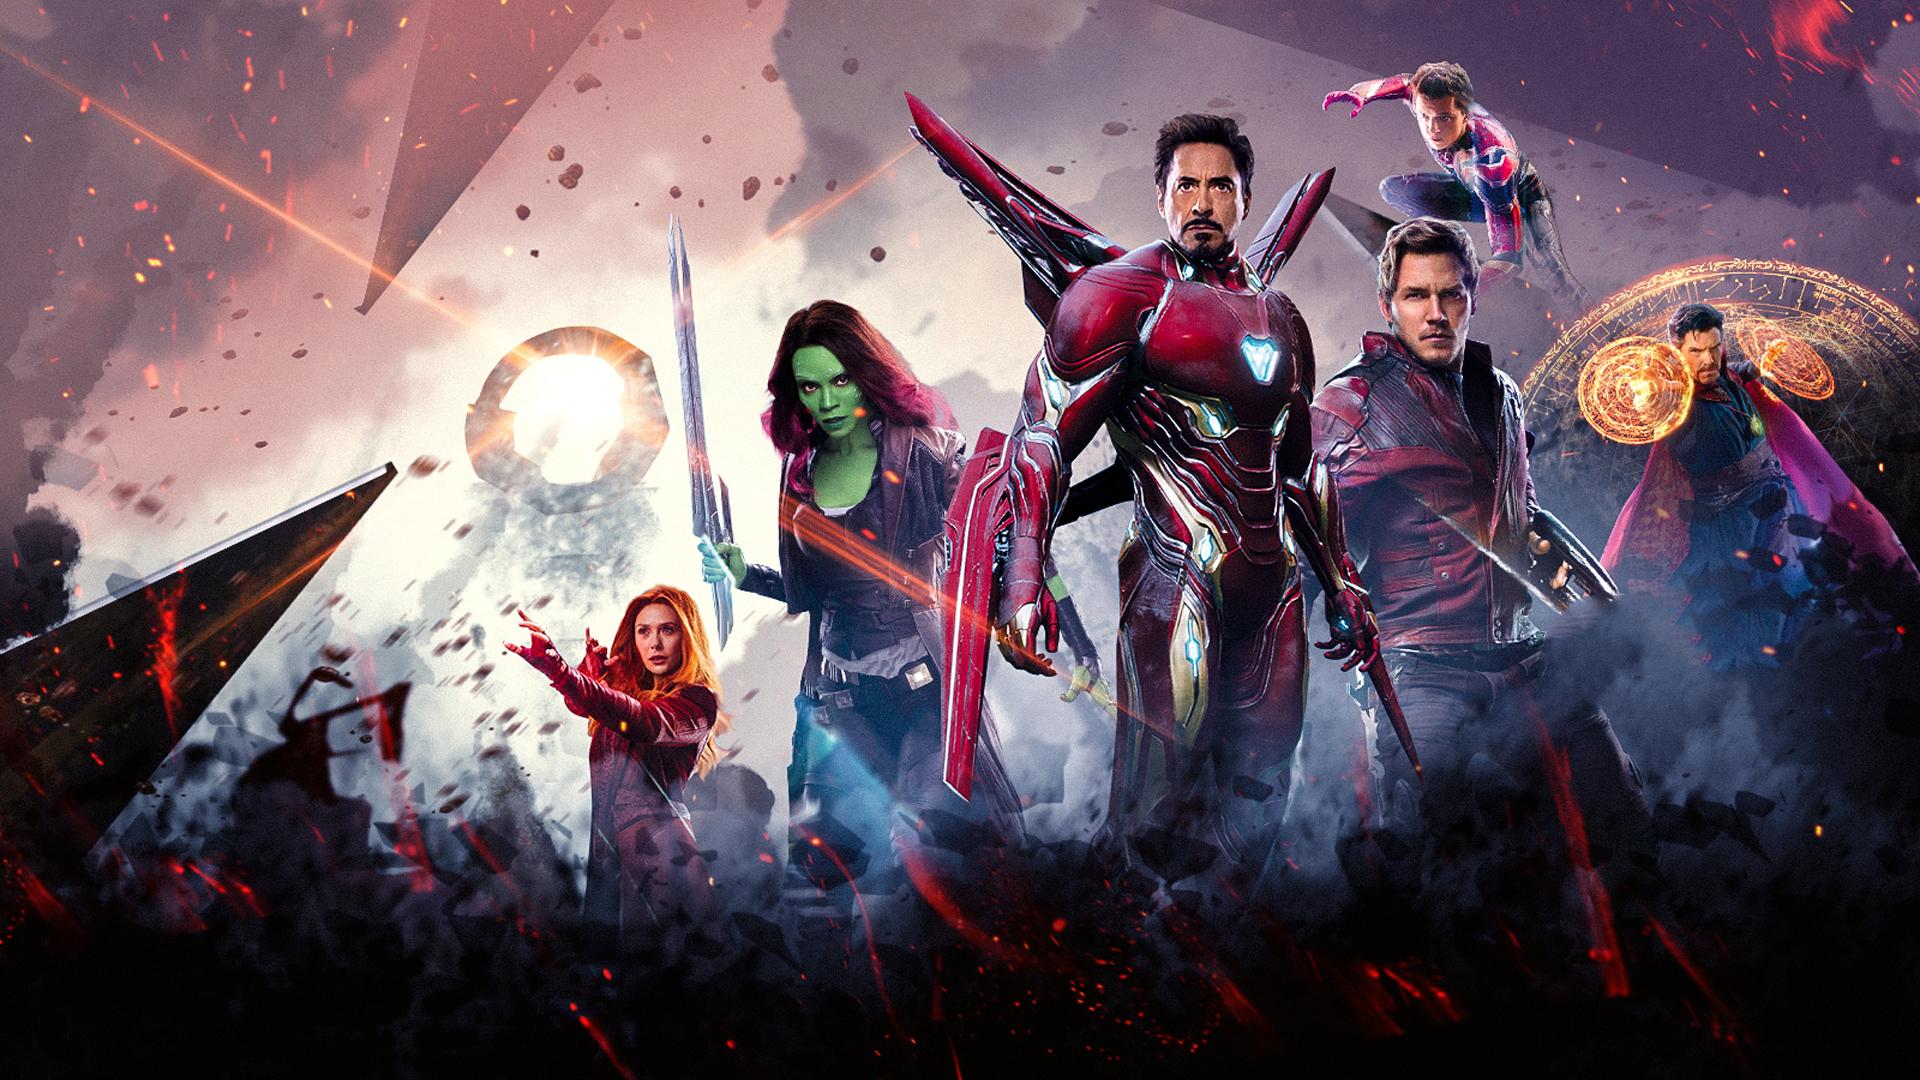 1920x1080 Avengers Infinity War Poster 2018 Laptop Full Hd 1080p Hd